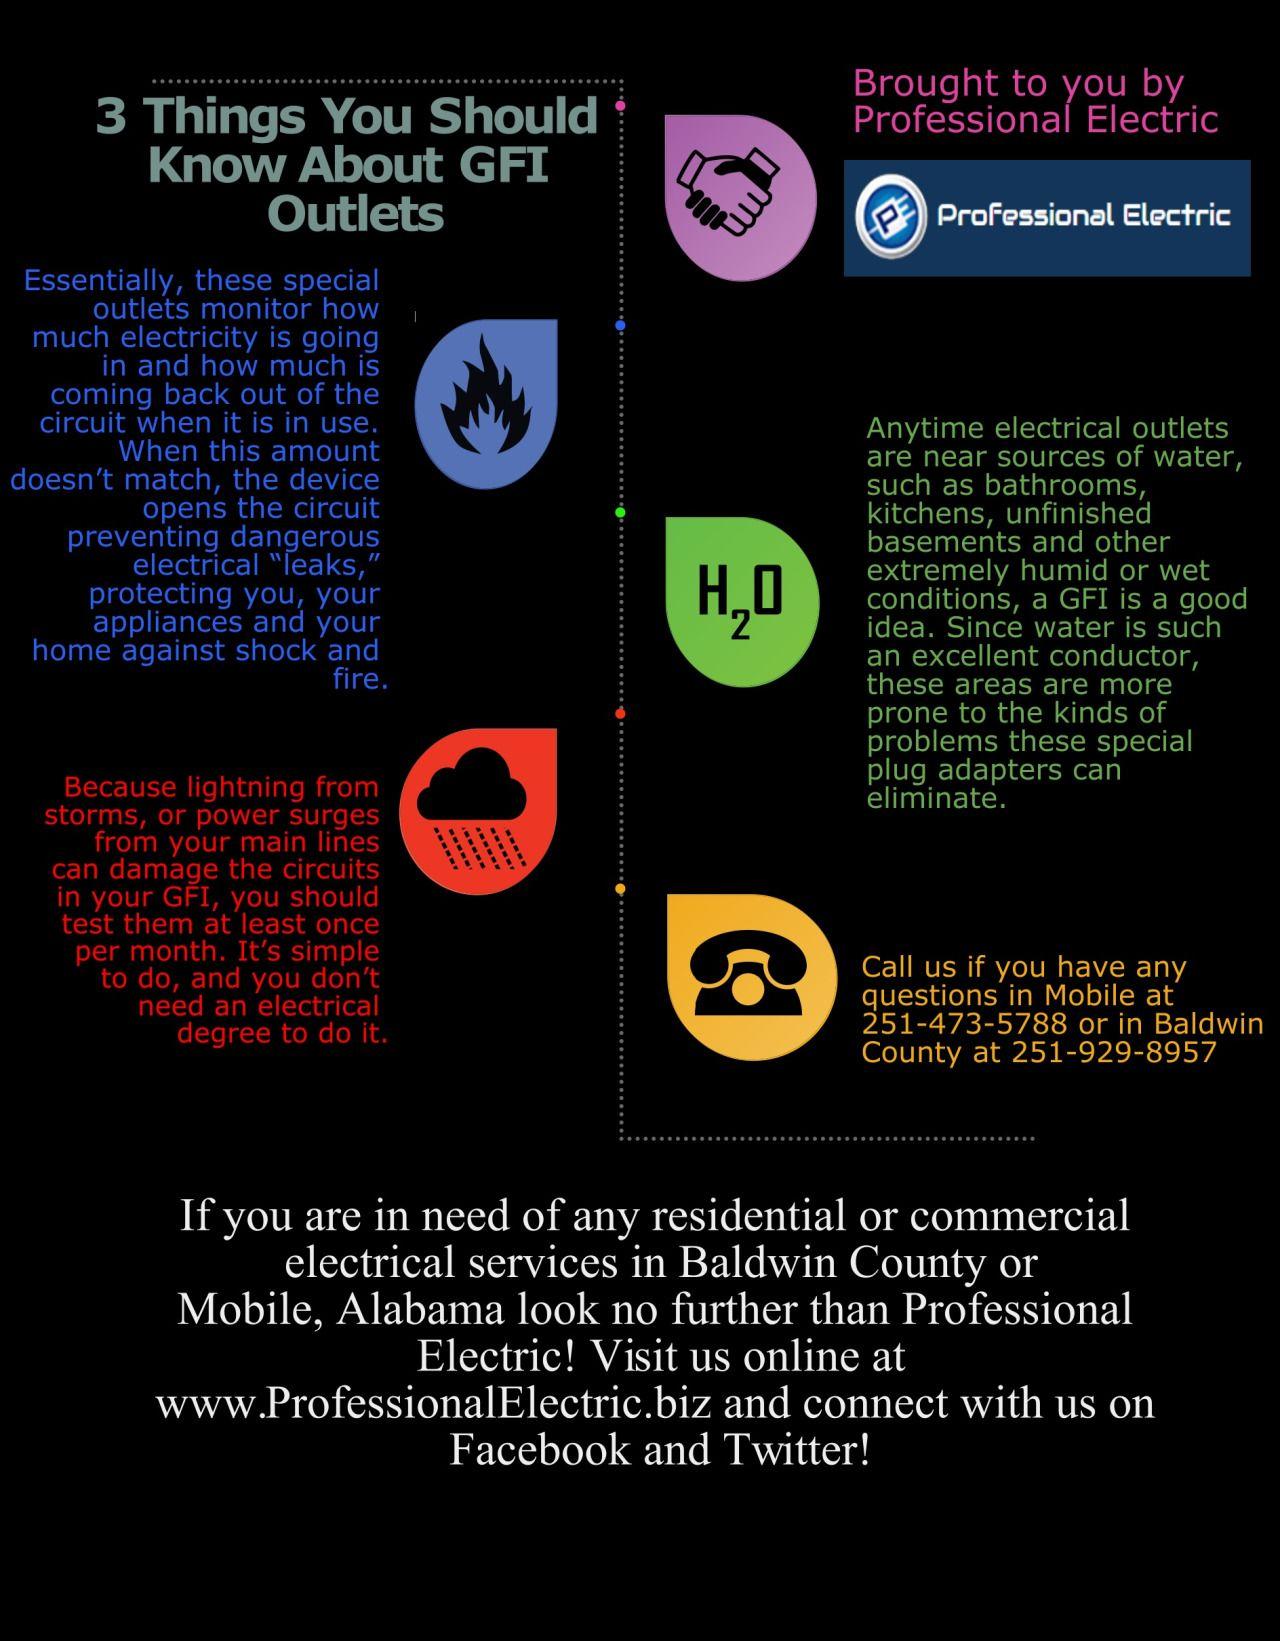 Electrician in baldwinmobile county alabama electrician